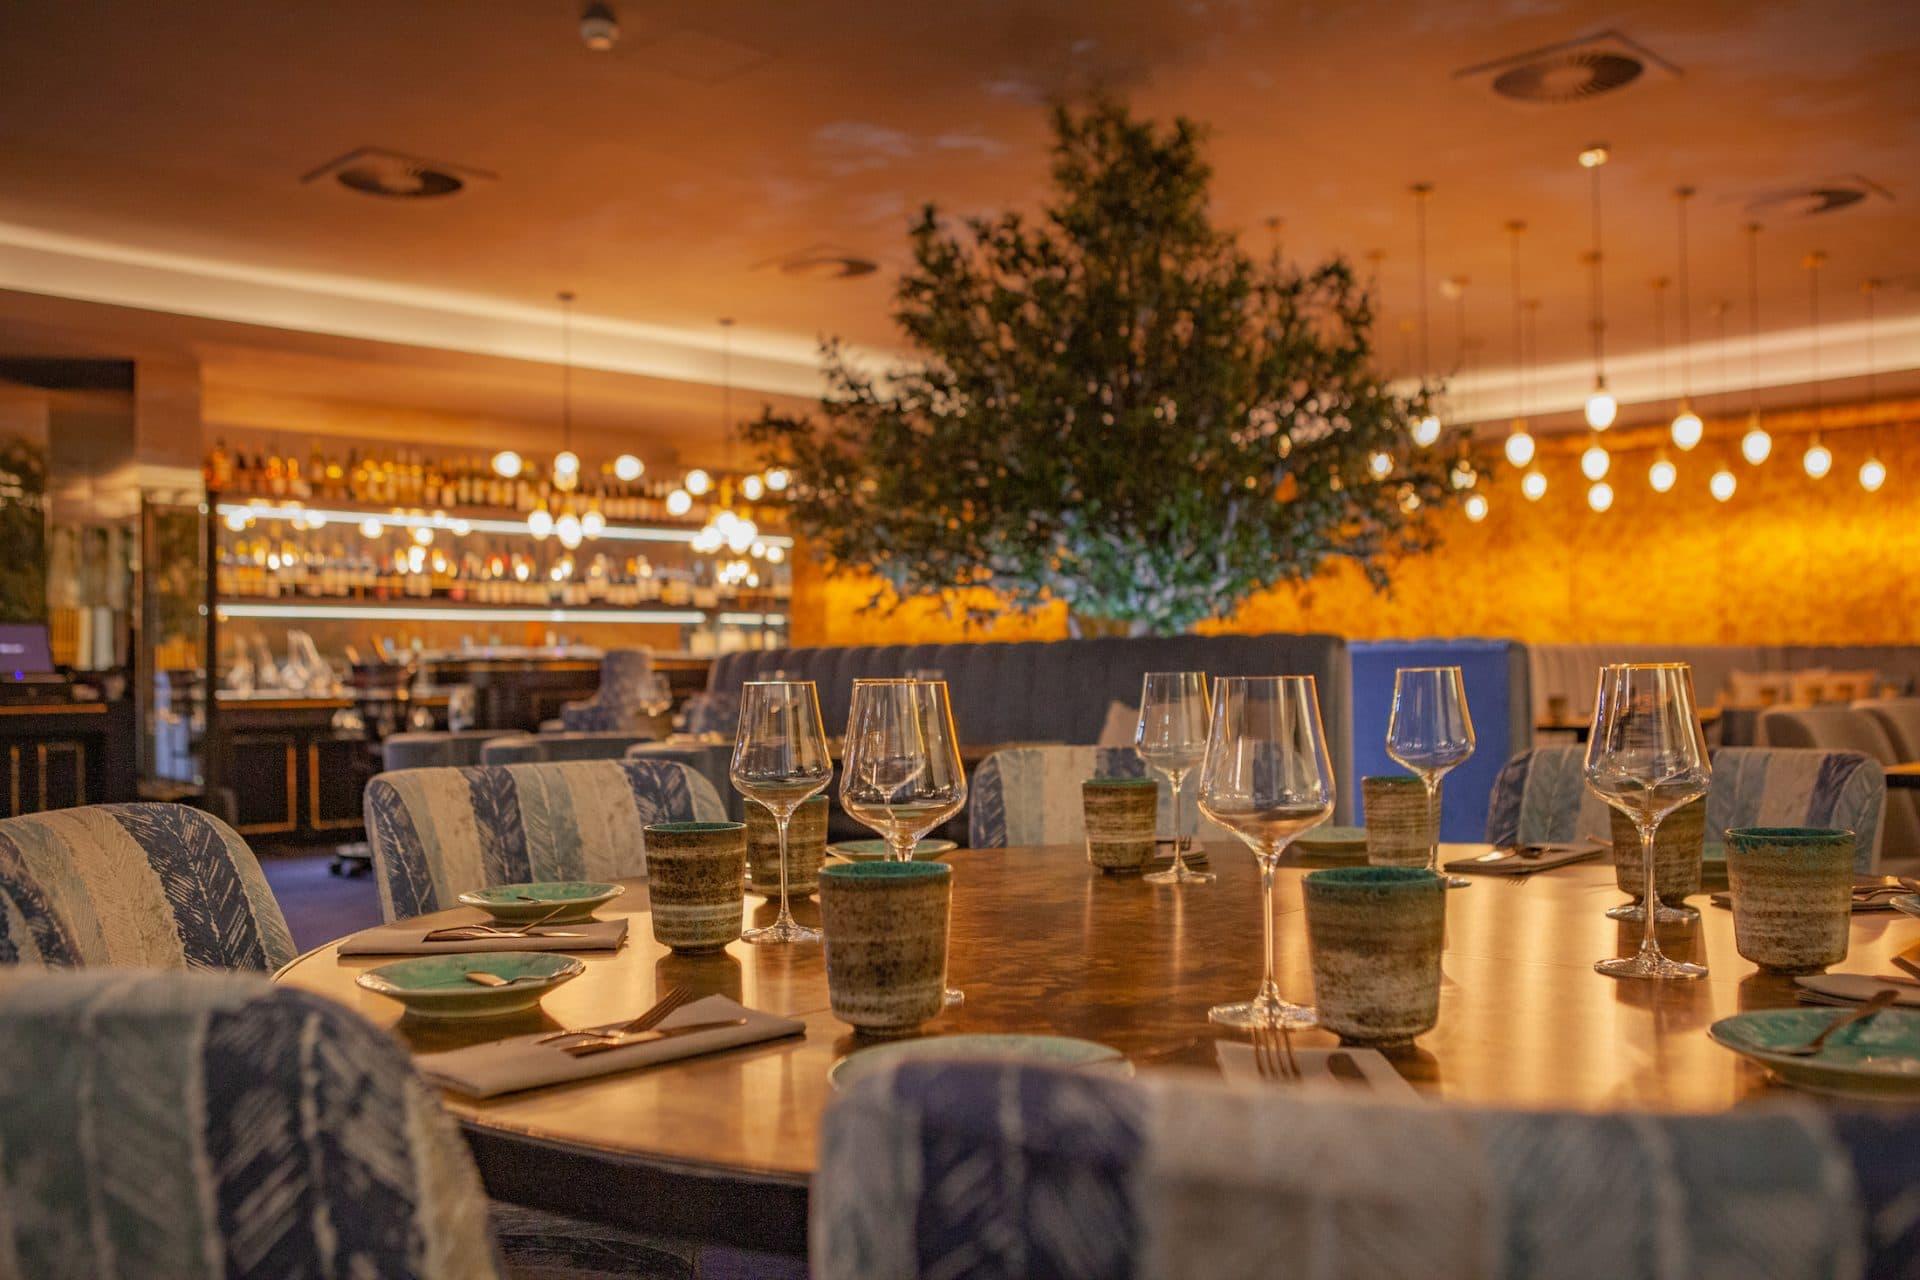 olivo-meat-wine-VidaMar-hotels-resorts-algarve-3